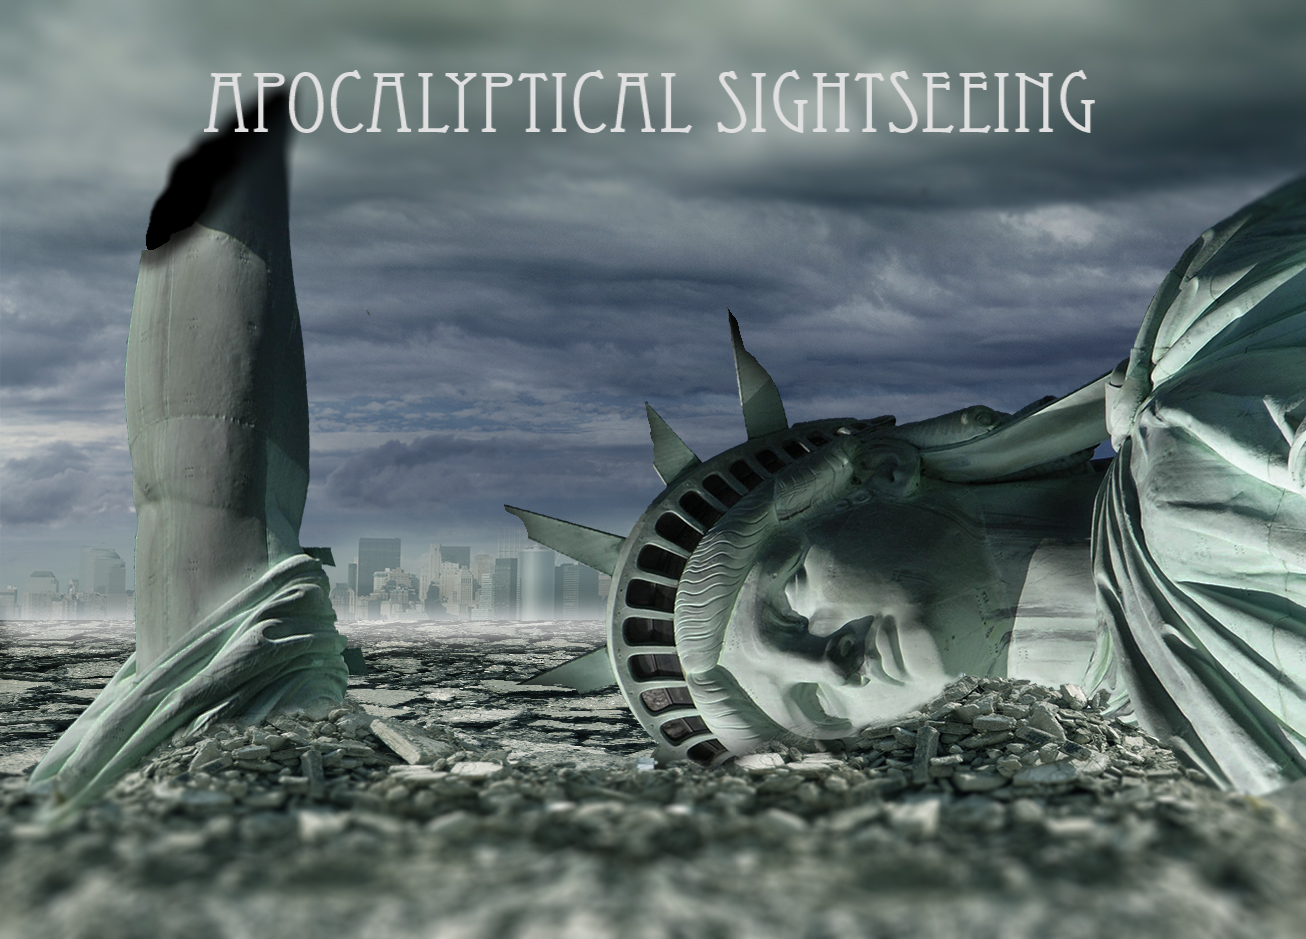 Apocalyptical Sightseeing